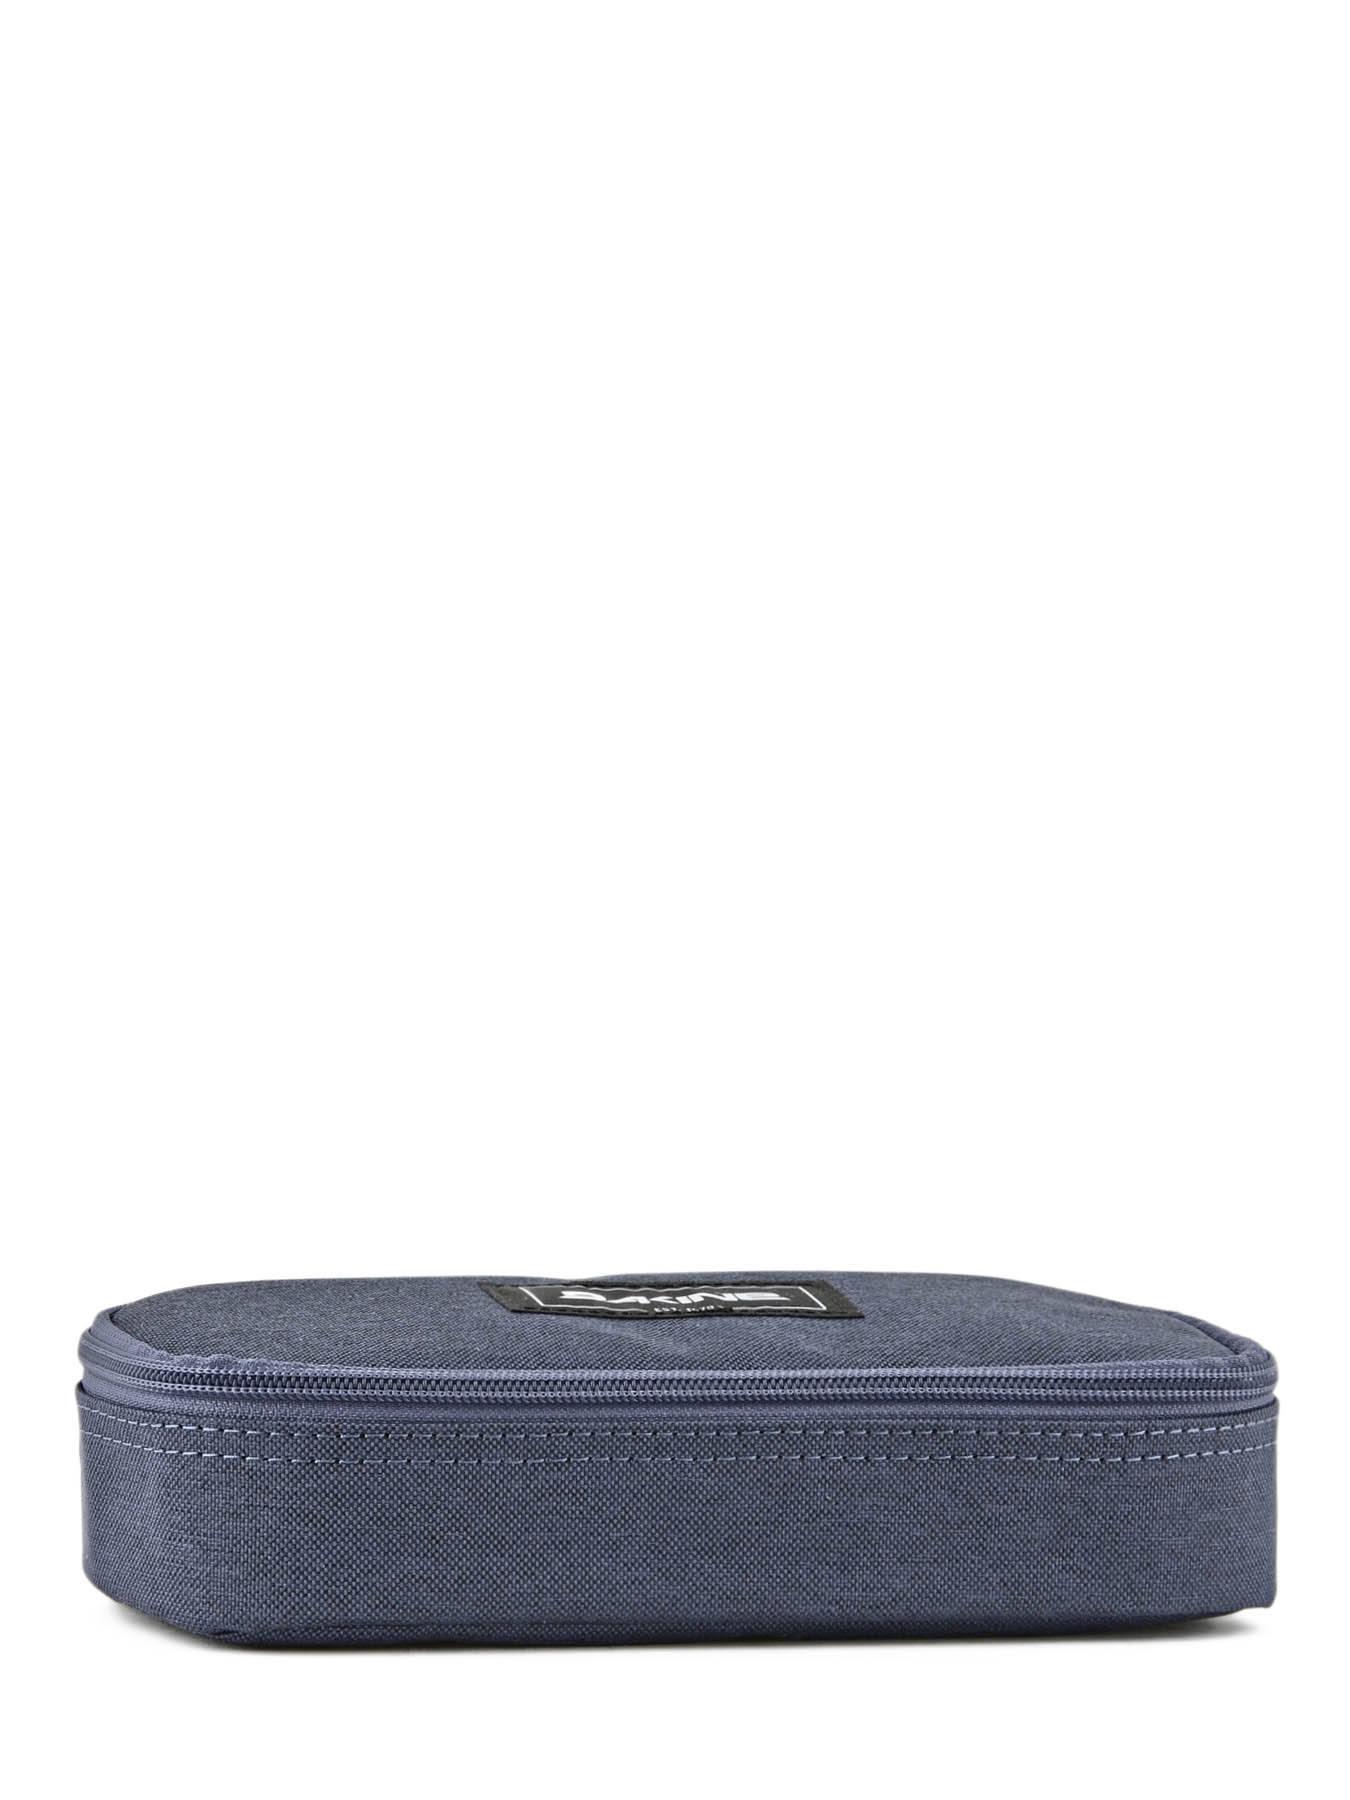 DAKINE Trousse 1 Compartiment Dakine Bleu